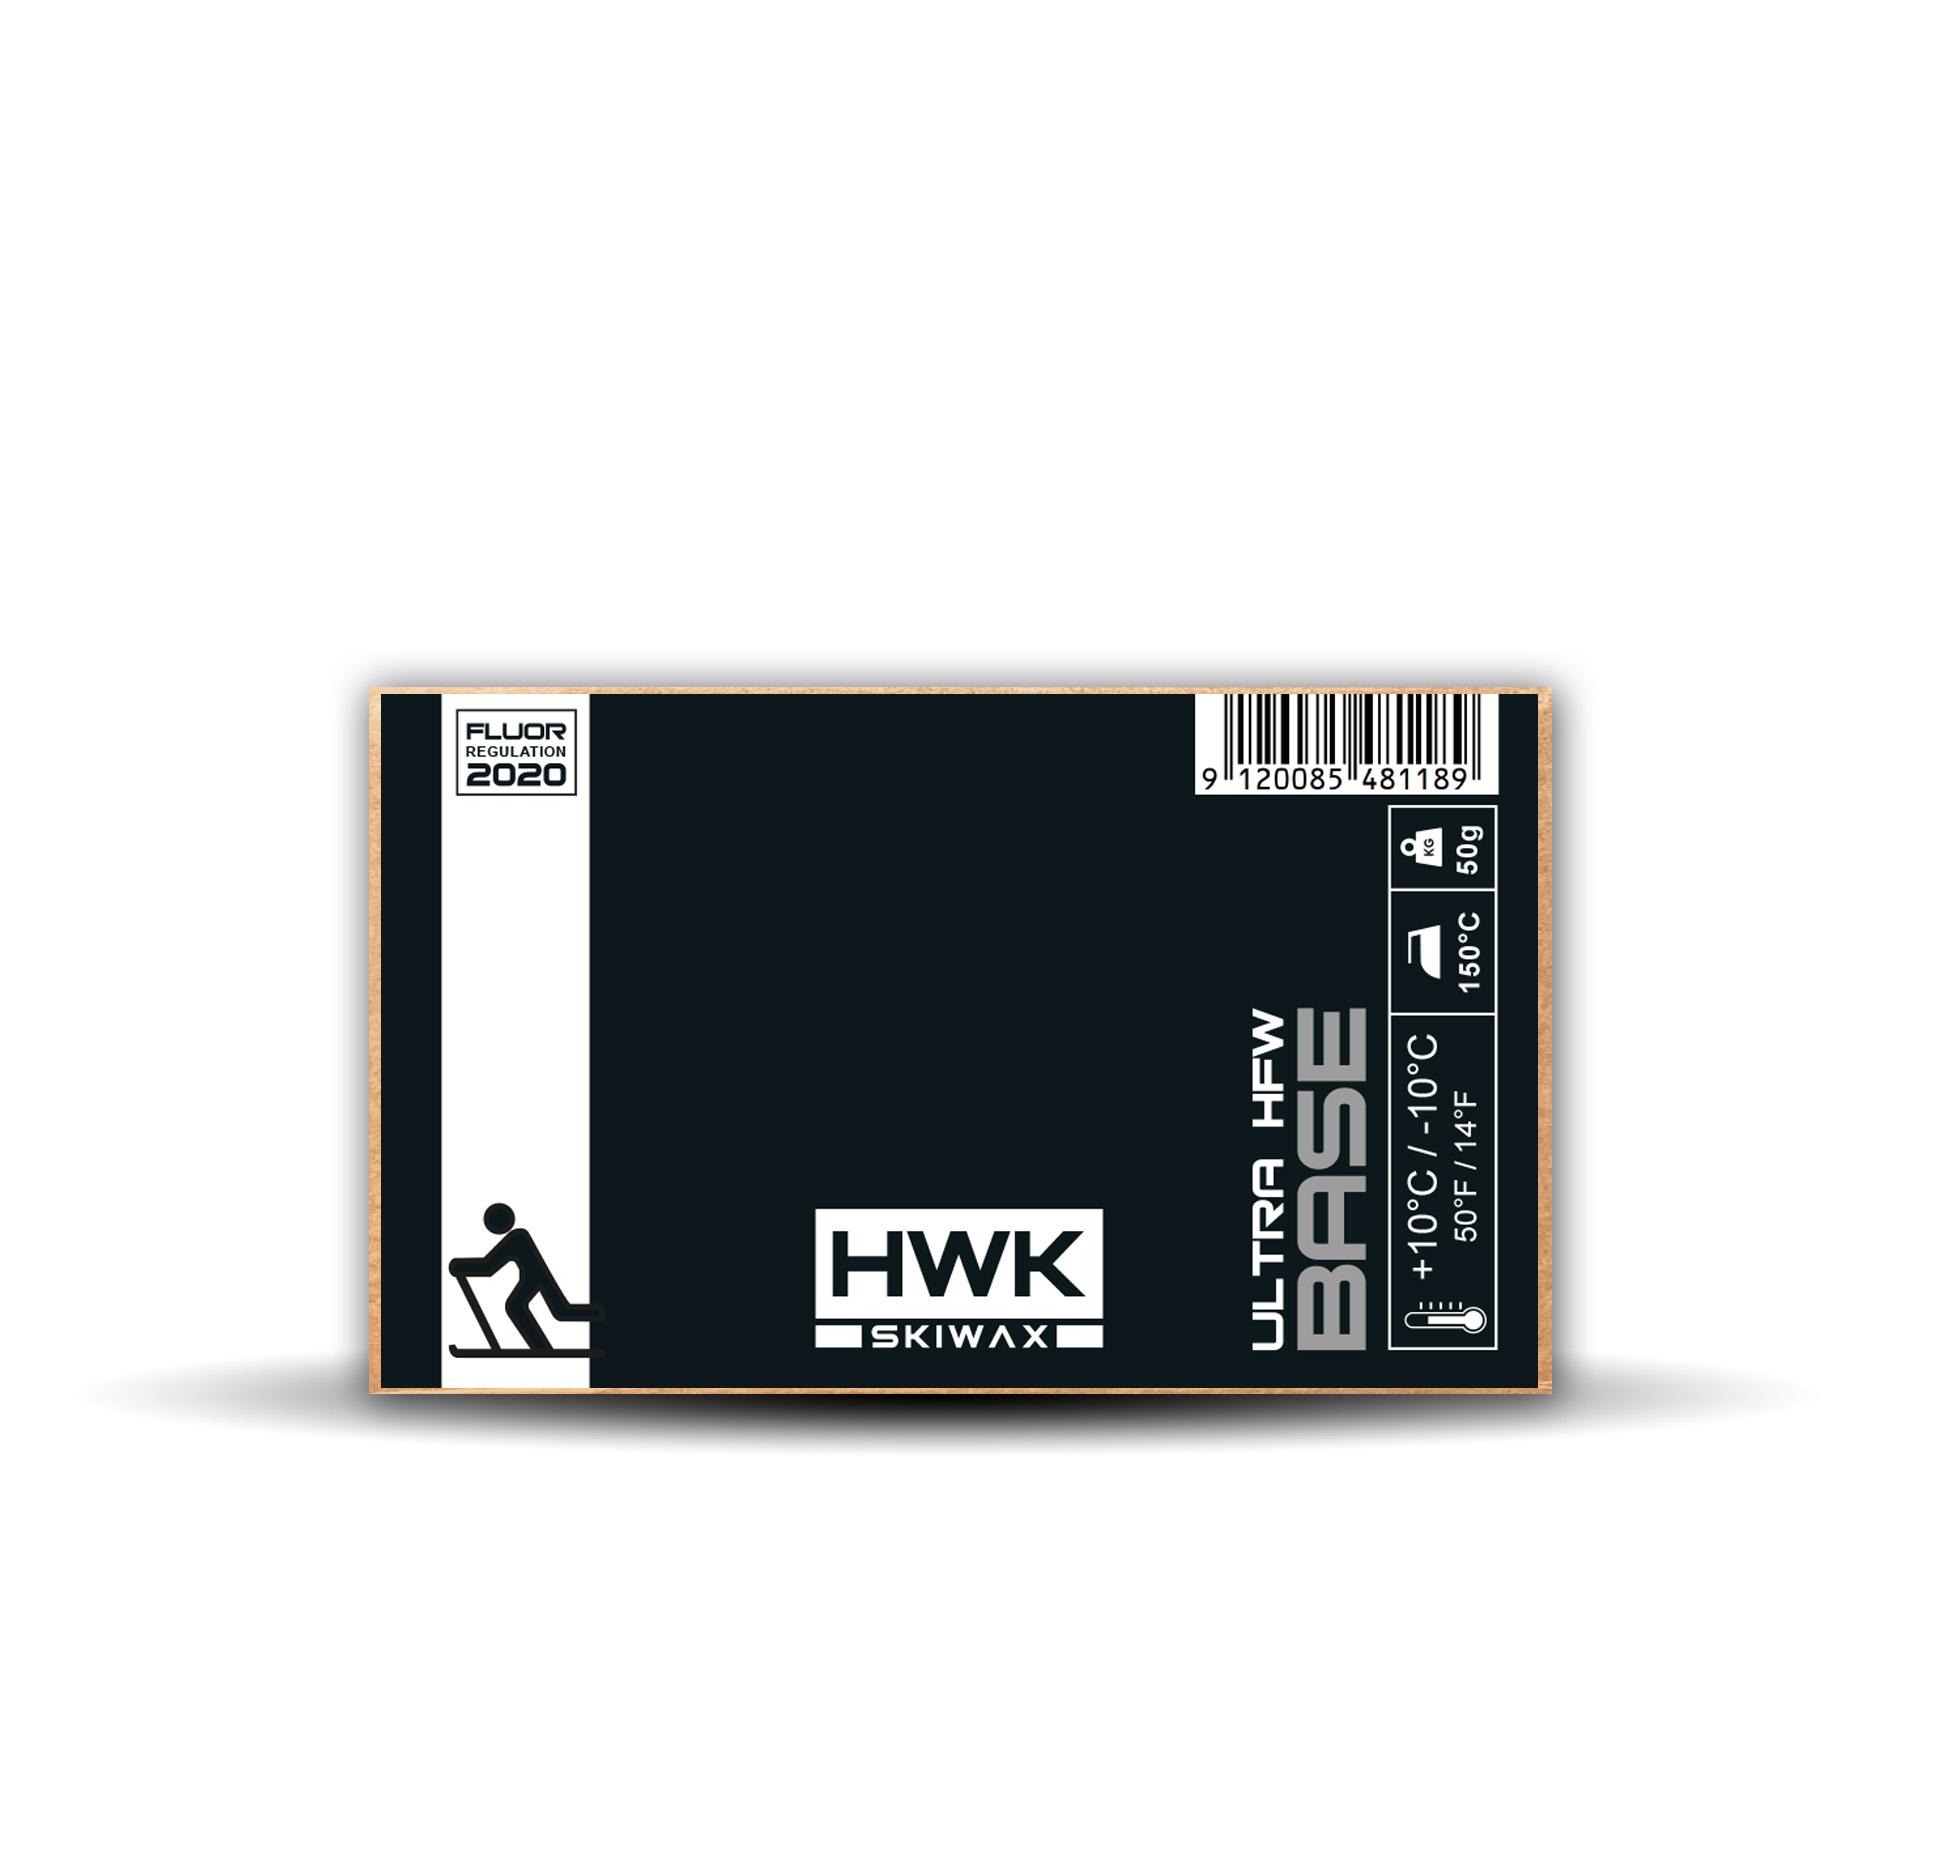 HWK ULTRA HFW Base